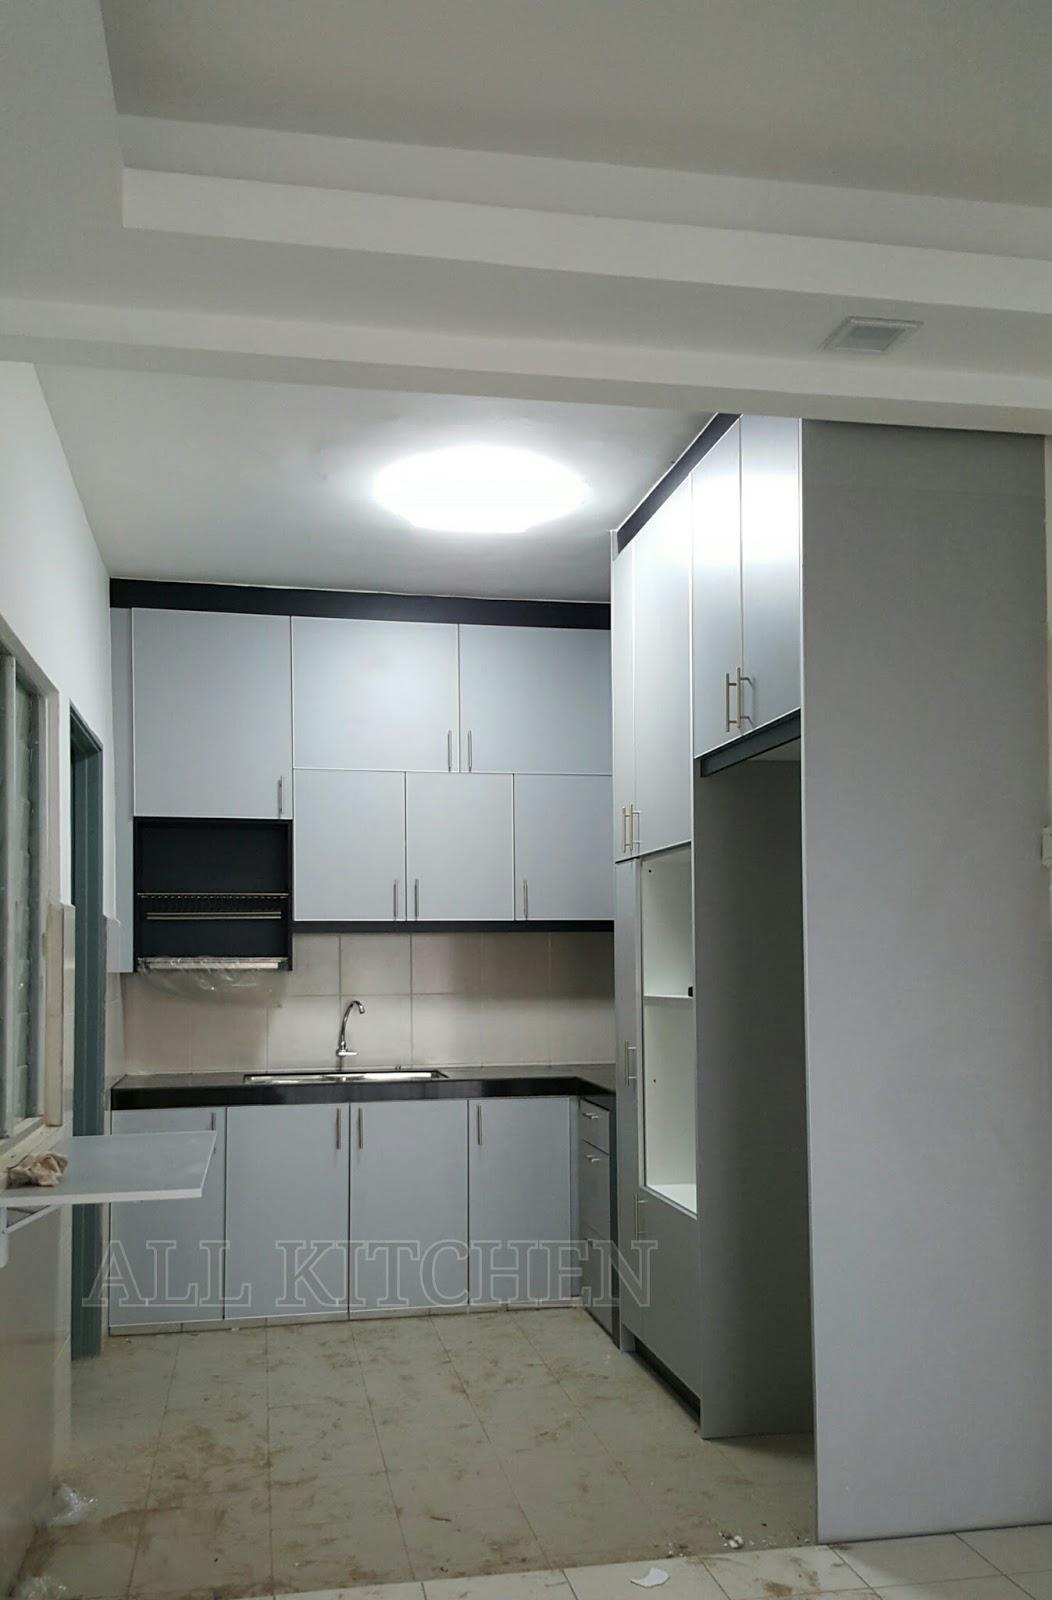 ALL KITCHEN KABINET DAPUR: Kitchen Cabinet Rumah Prima 1 Malaysia